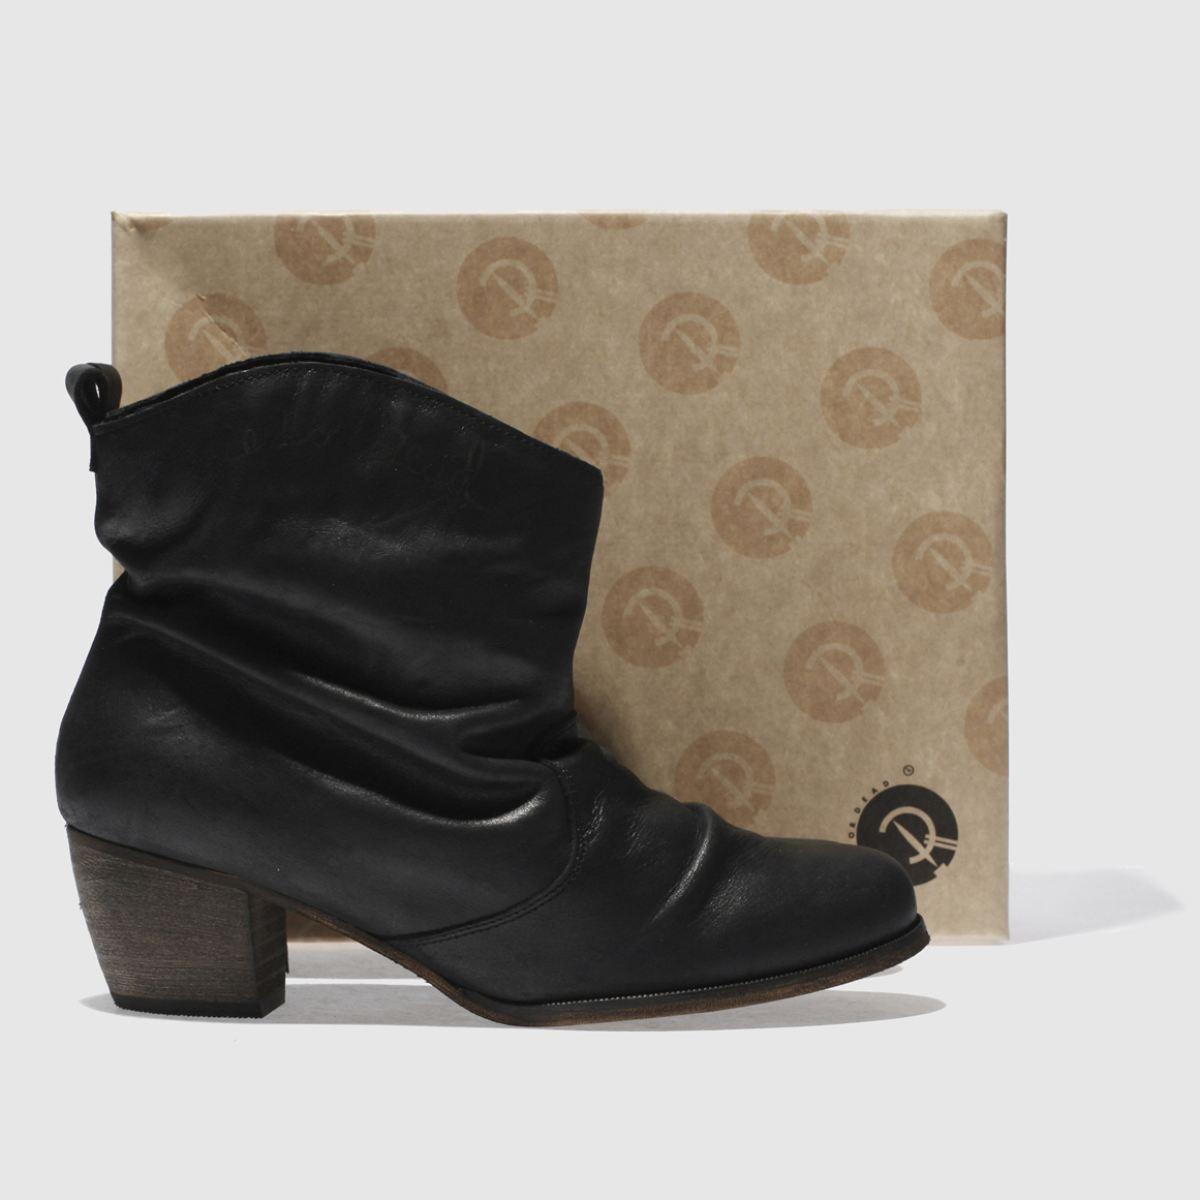 Damen Schwarz red or dead Austin Boots beliebte | schuh Gute Qualität beliebte Boots Schuhe 2f7b6f